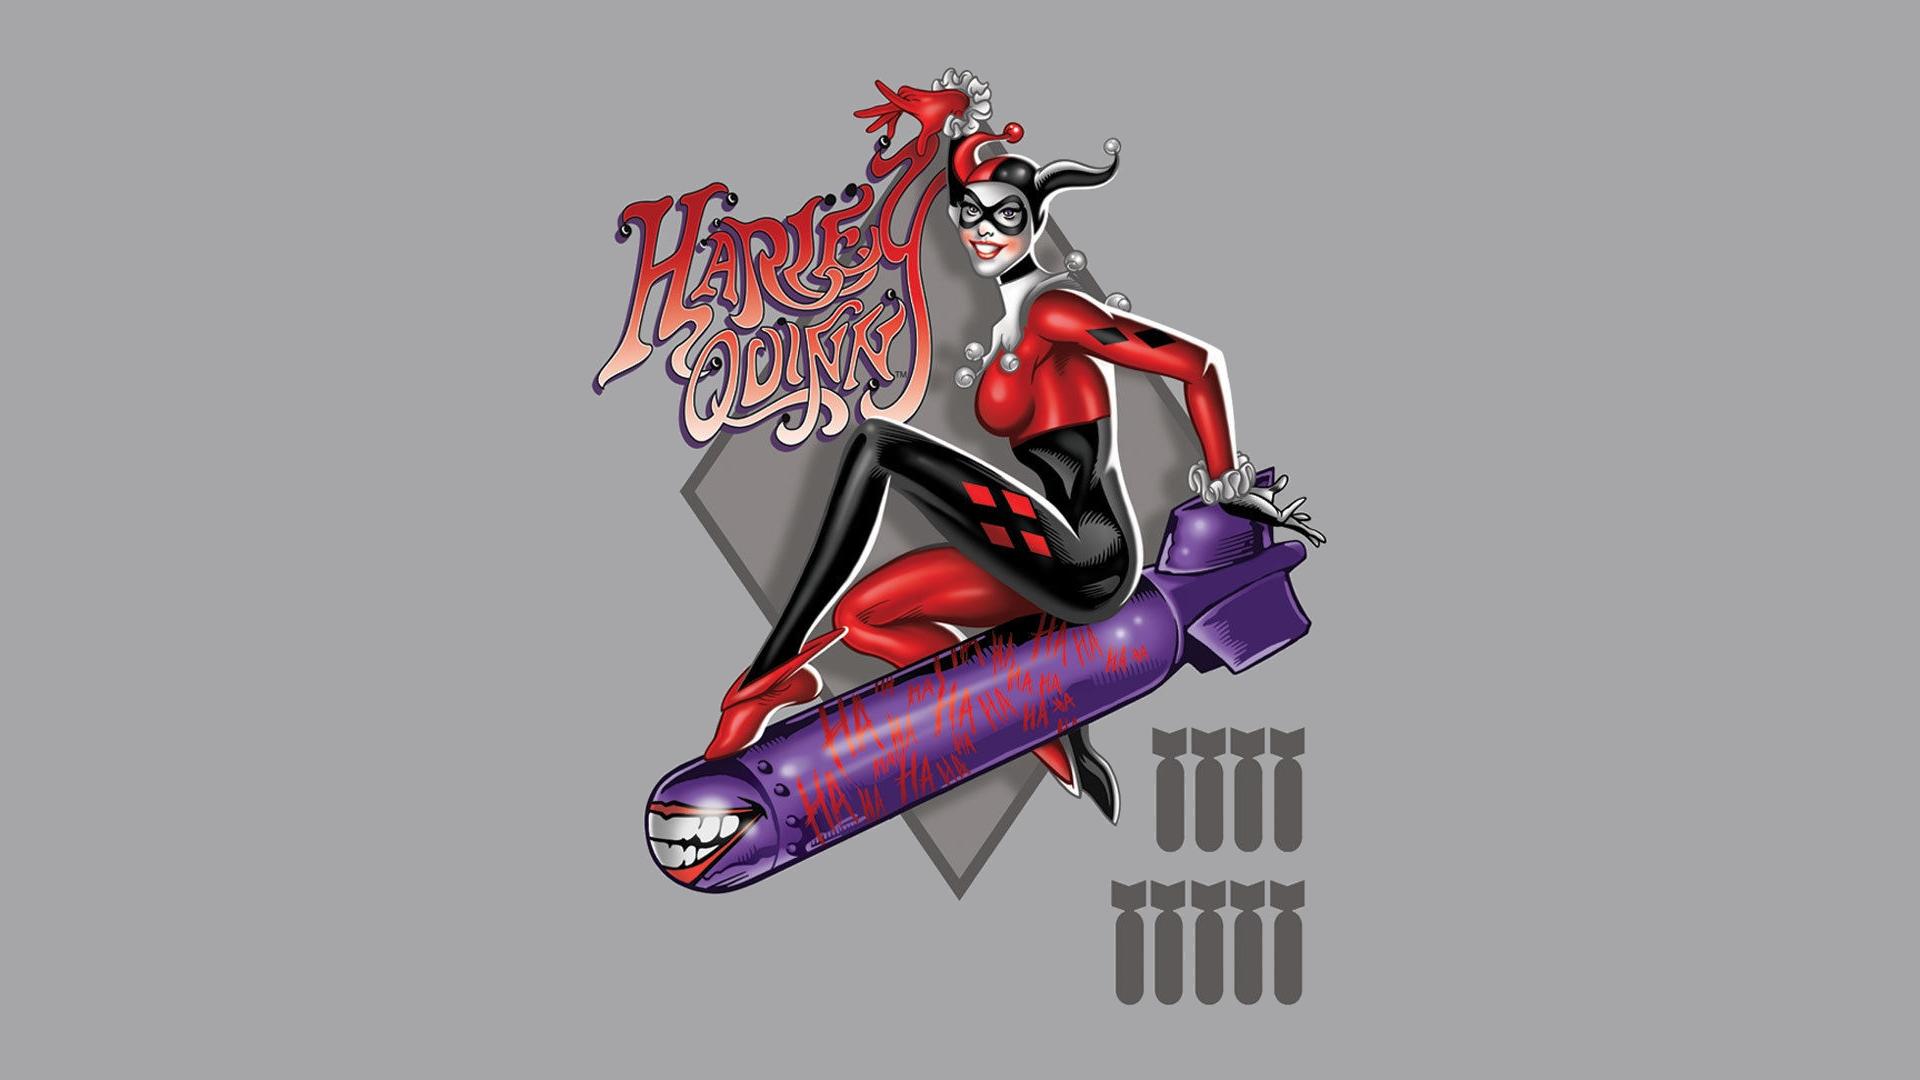 Comics Harley Quinn 1920x1080